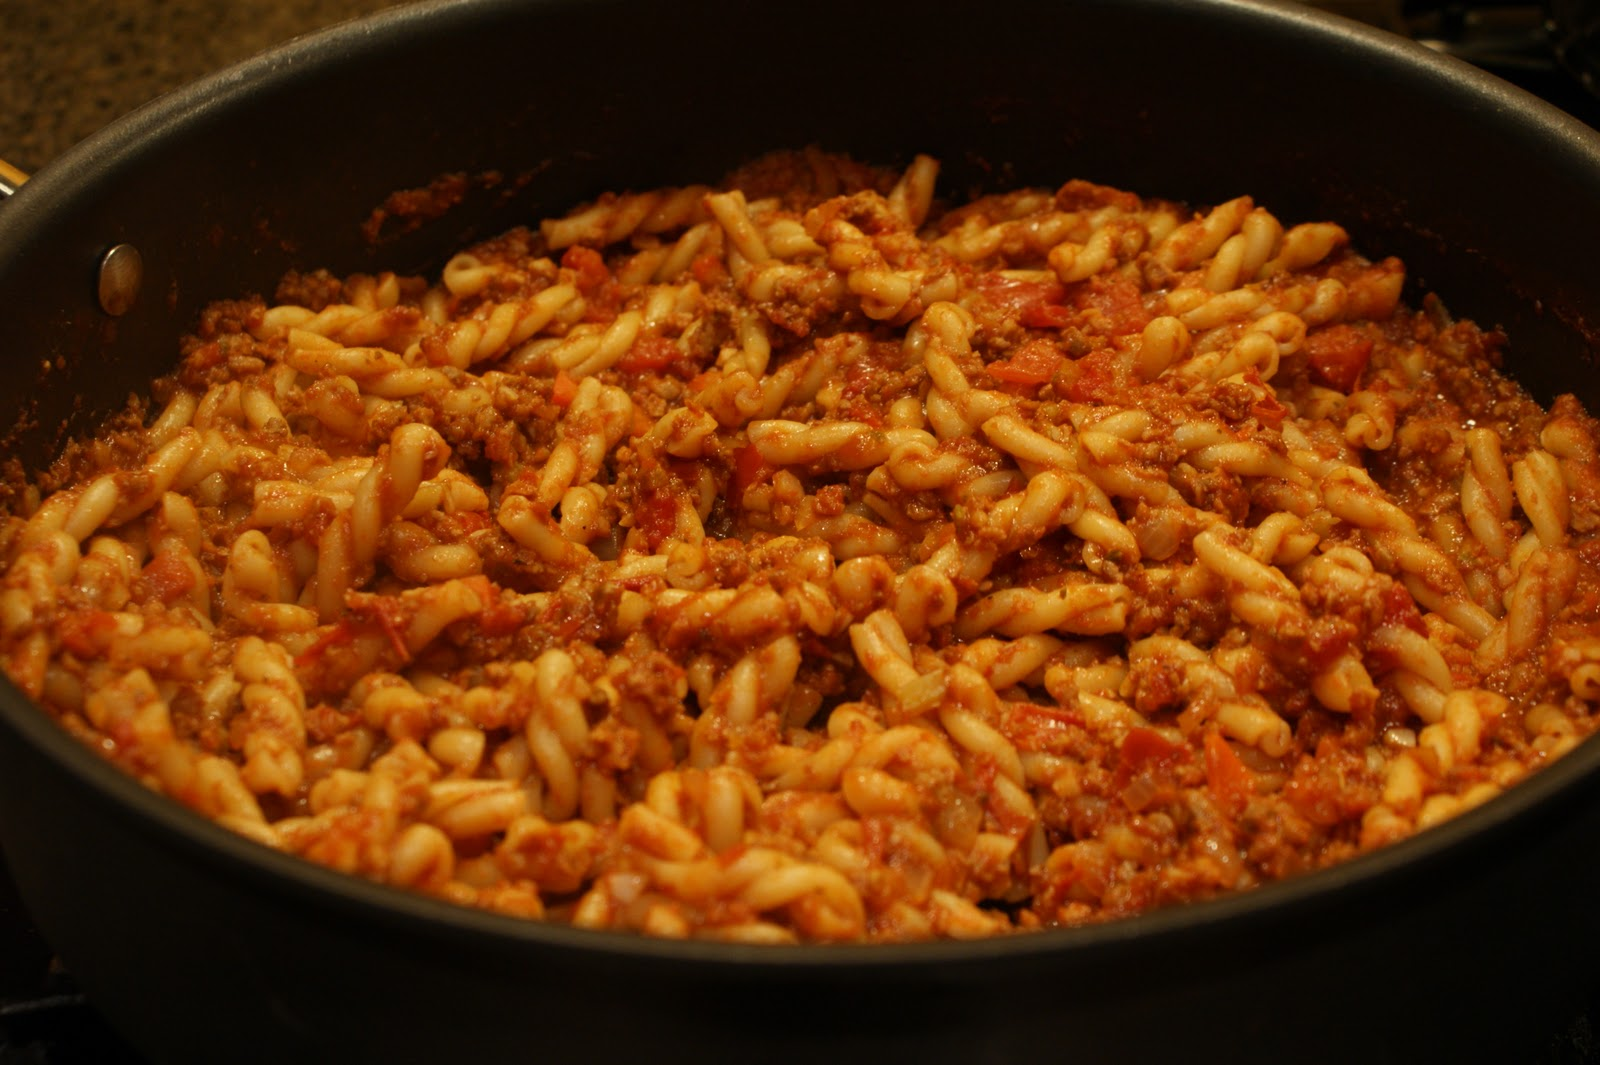 Vegan Fazool: Ragu Alla Bolognese